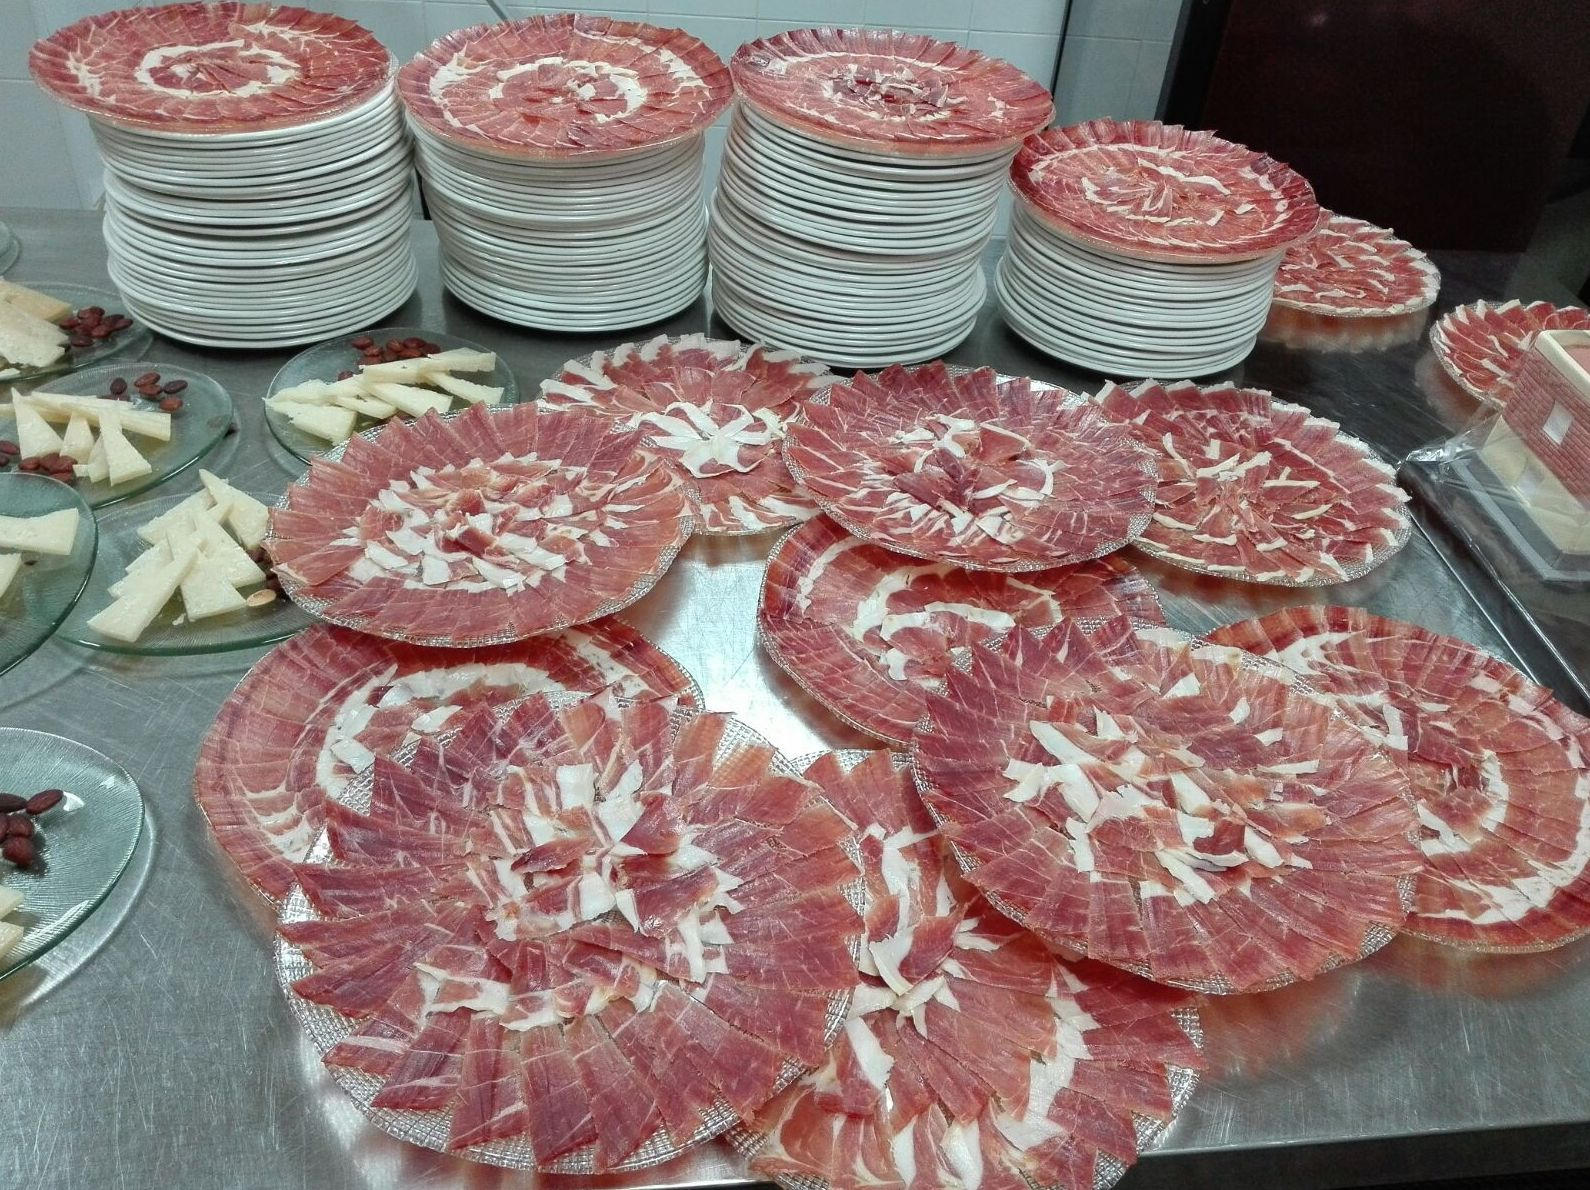 Platos de jamón en El Chaleco